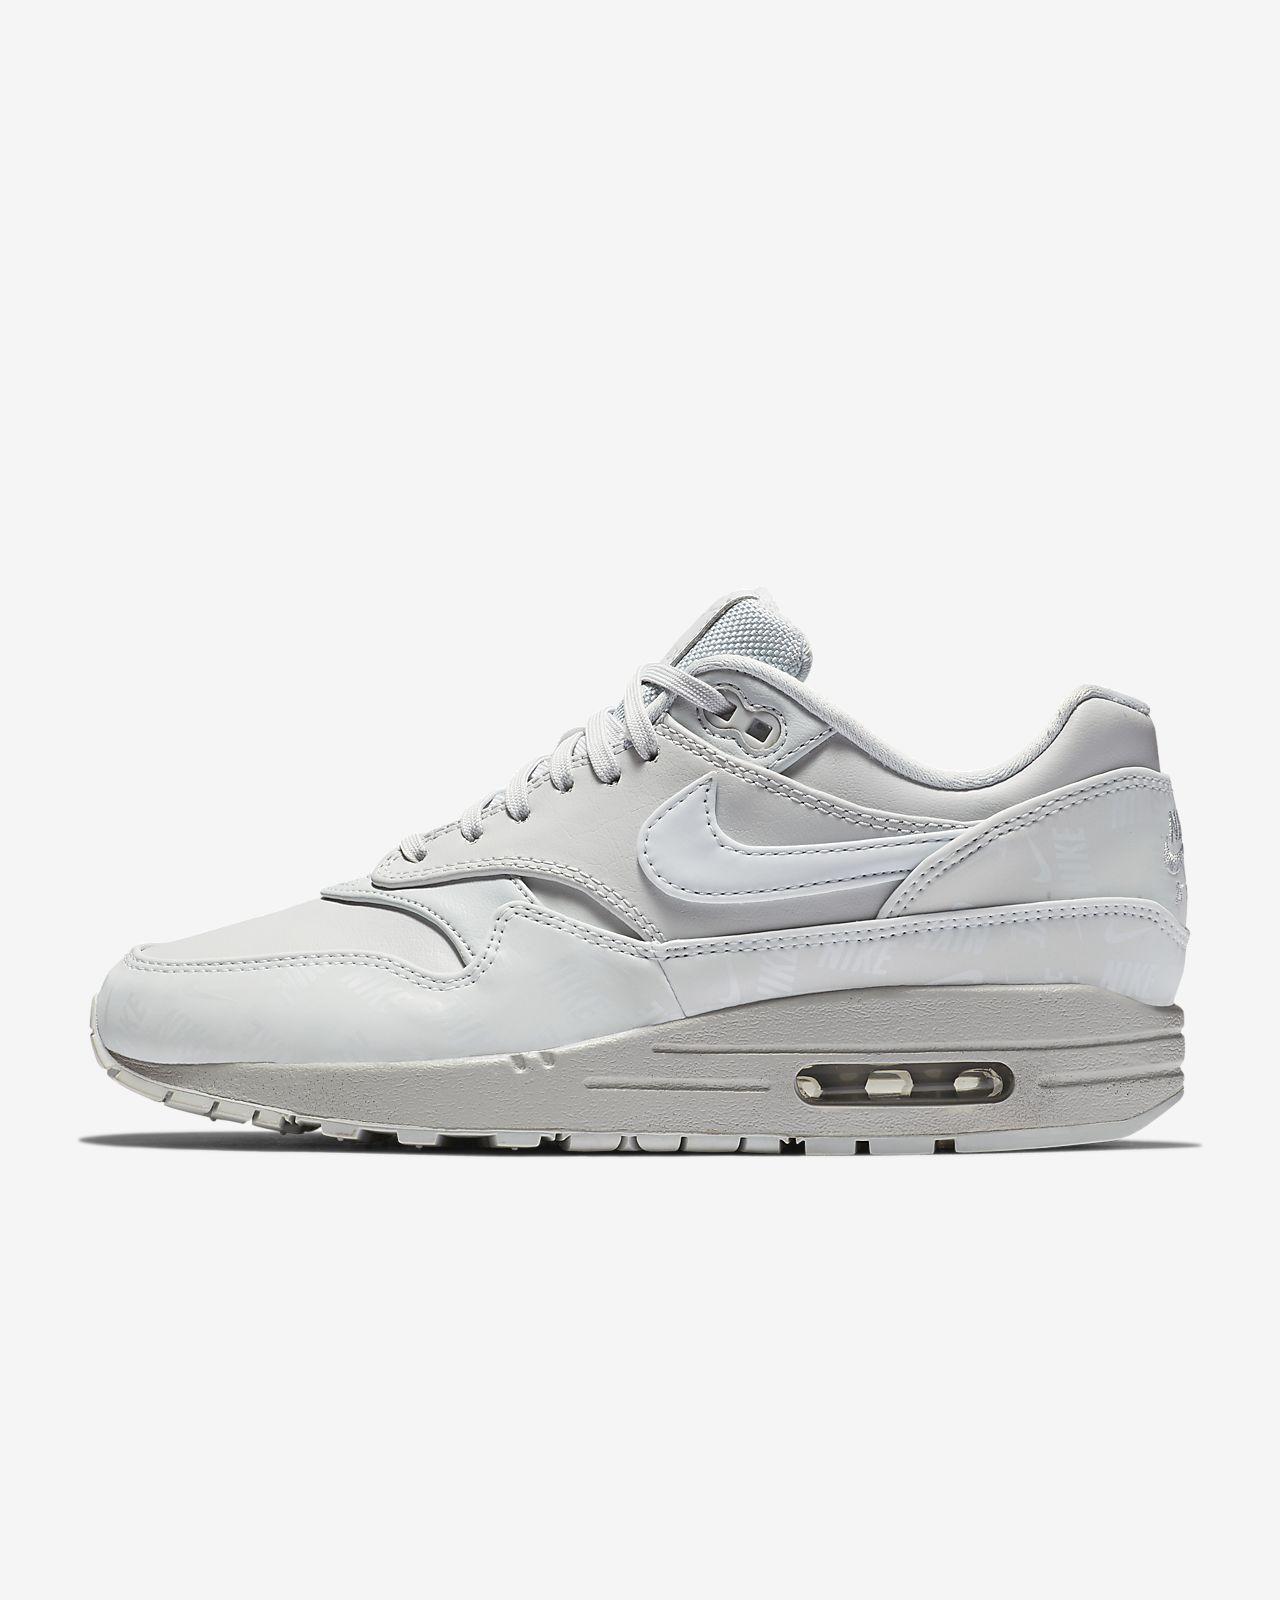 624832c153e9 Nike Air Max 1 LX Women s Shoe. Nike.com NZ